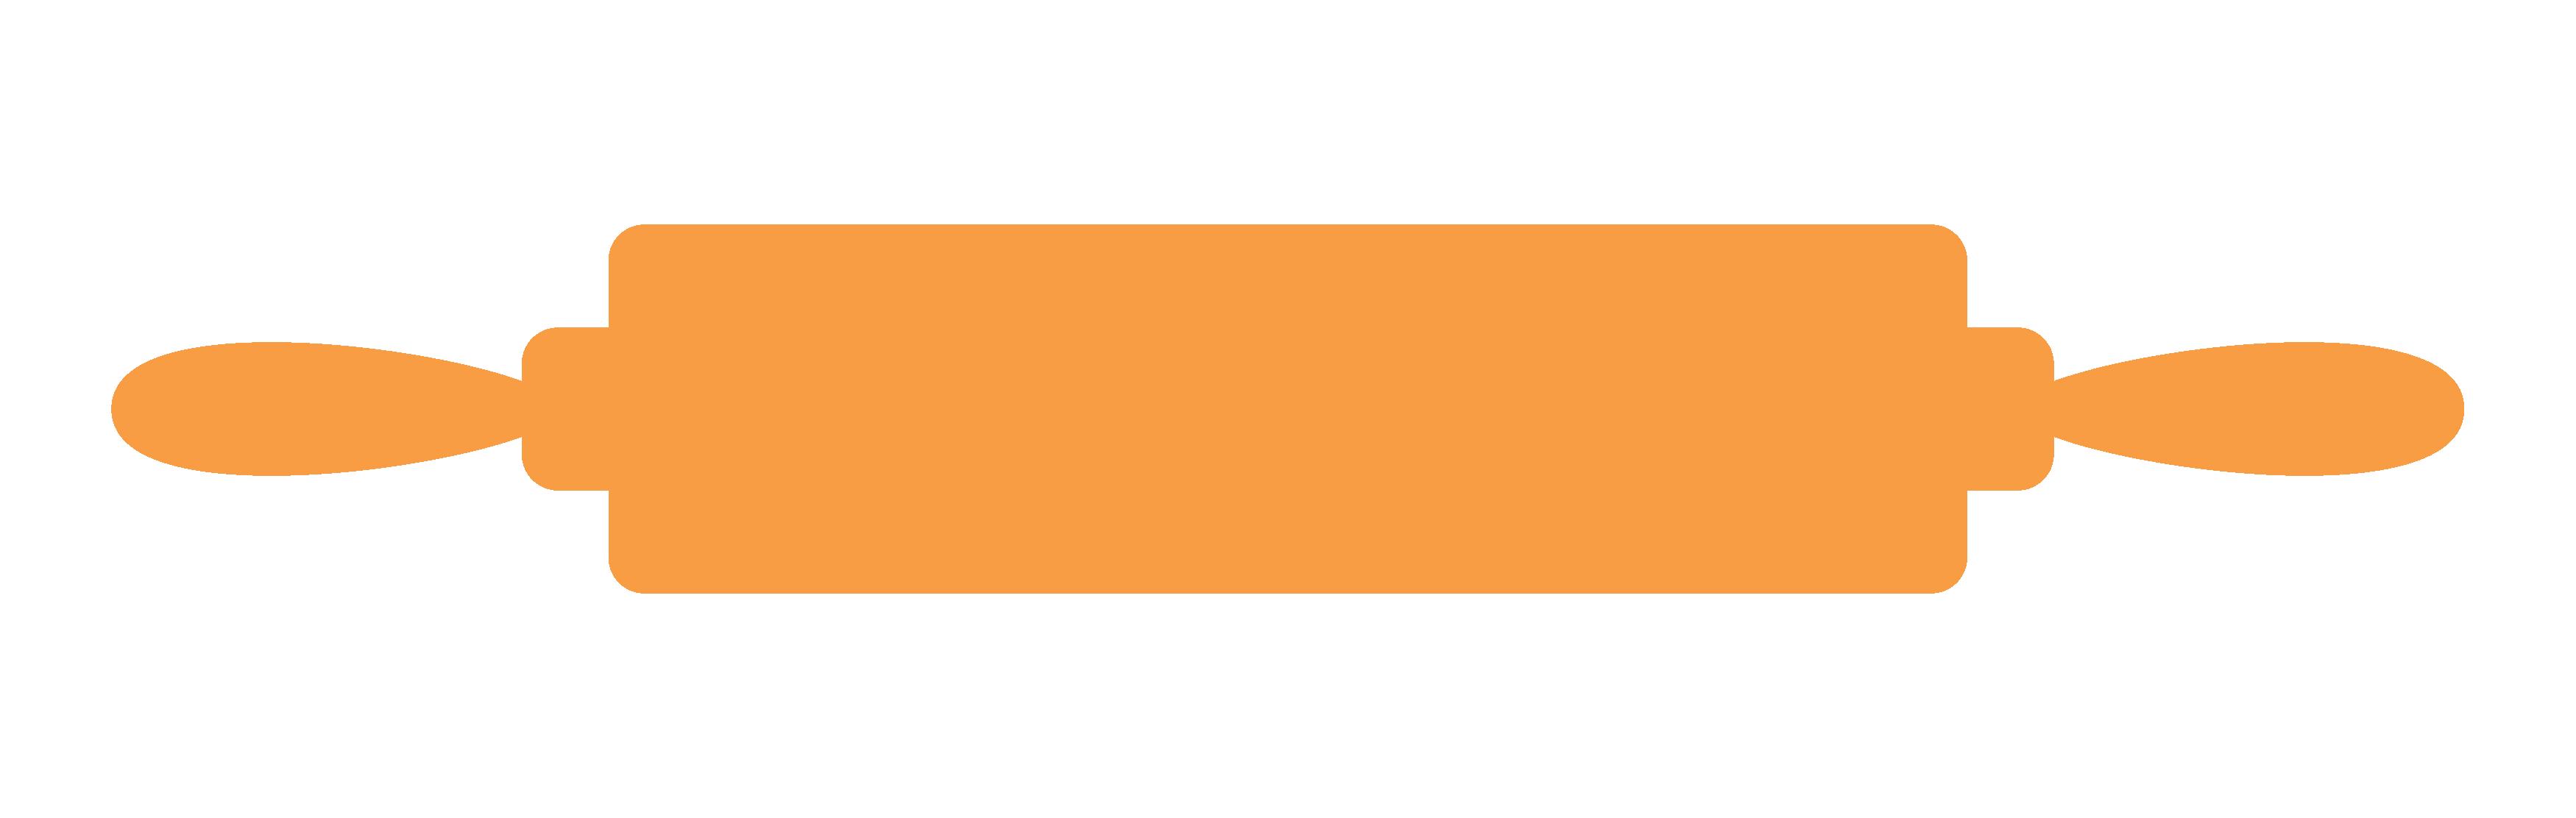 Orange book clipart graphic royalty free stock CC Kitchen Utensils Clip Art-Rolling Pin - Zen & Spice graphic royalty free stock